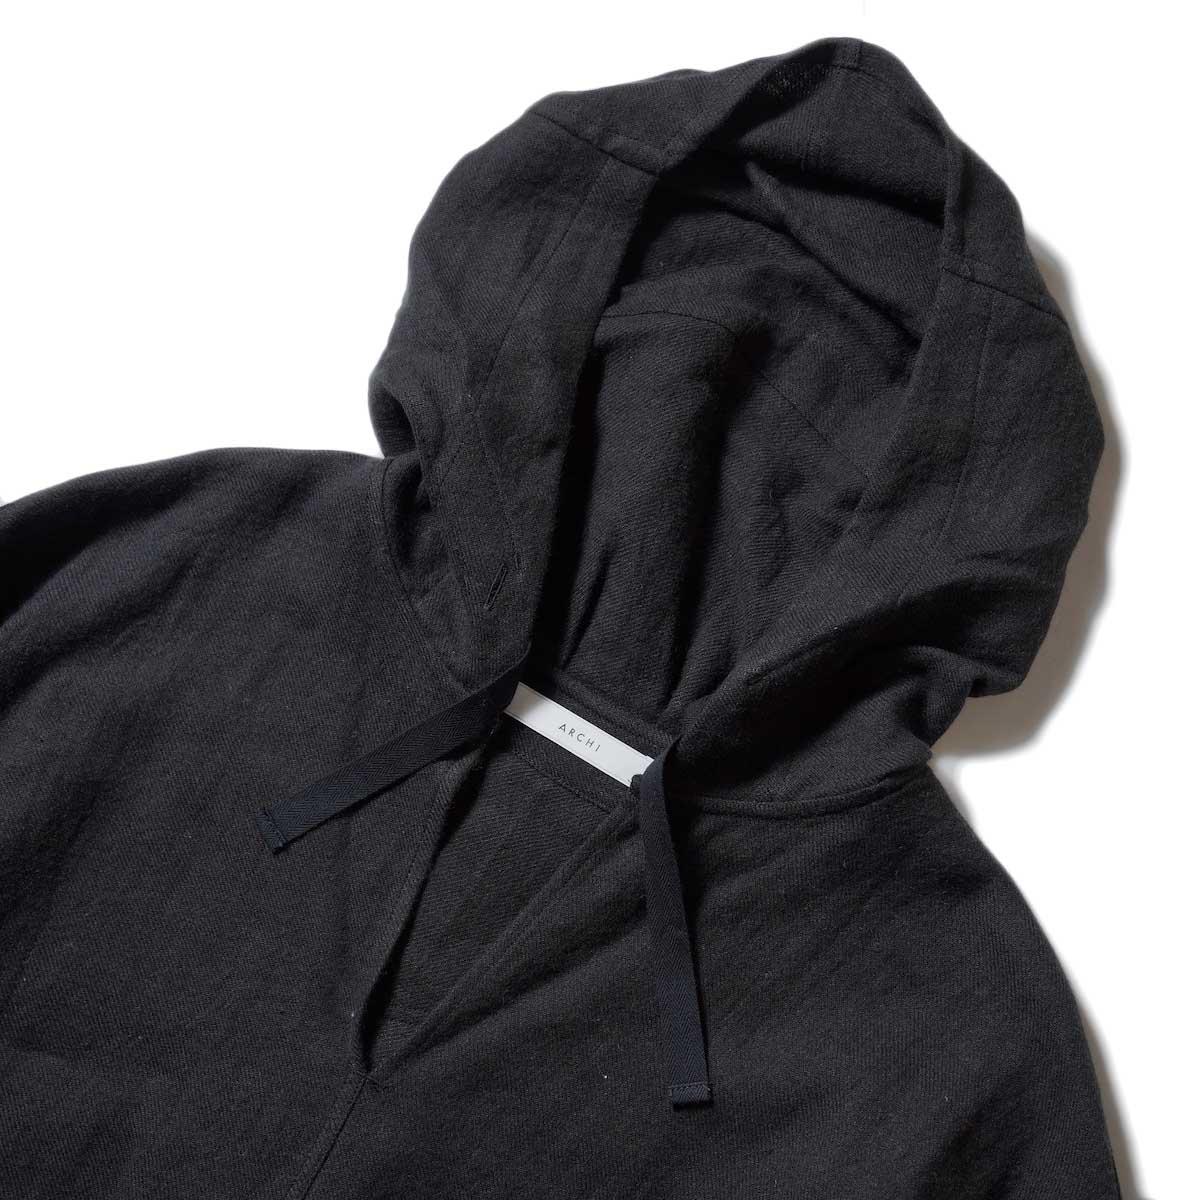 ARCHI / SOFT TWIST TWILL HOODIE OVER SHIRTS (Black) フロント